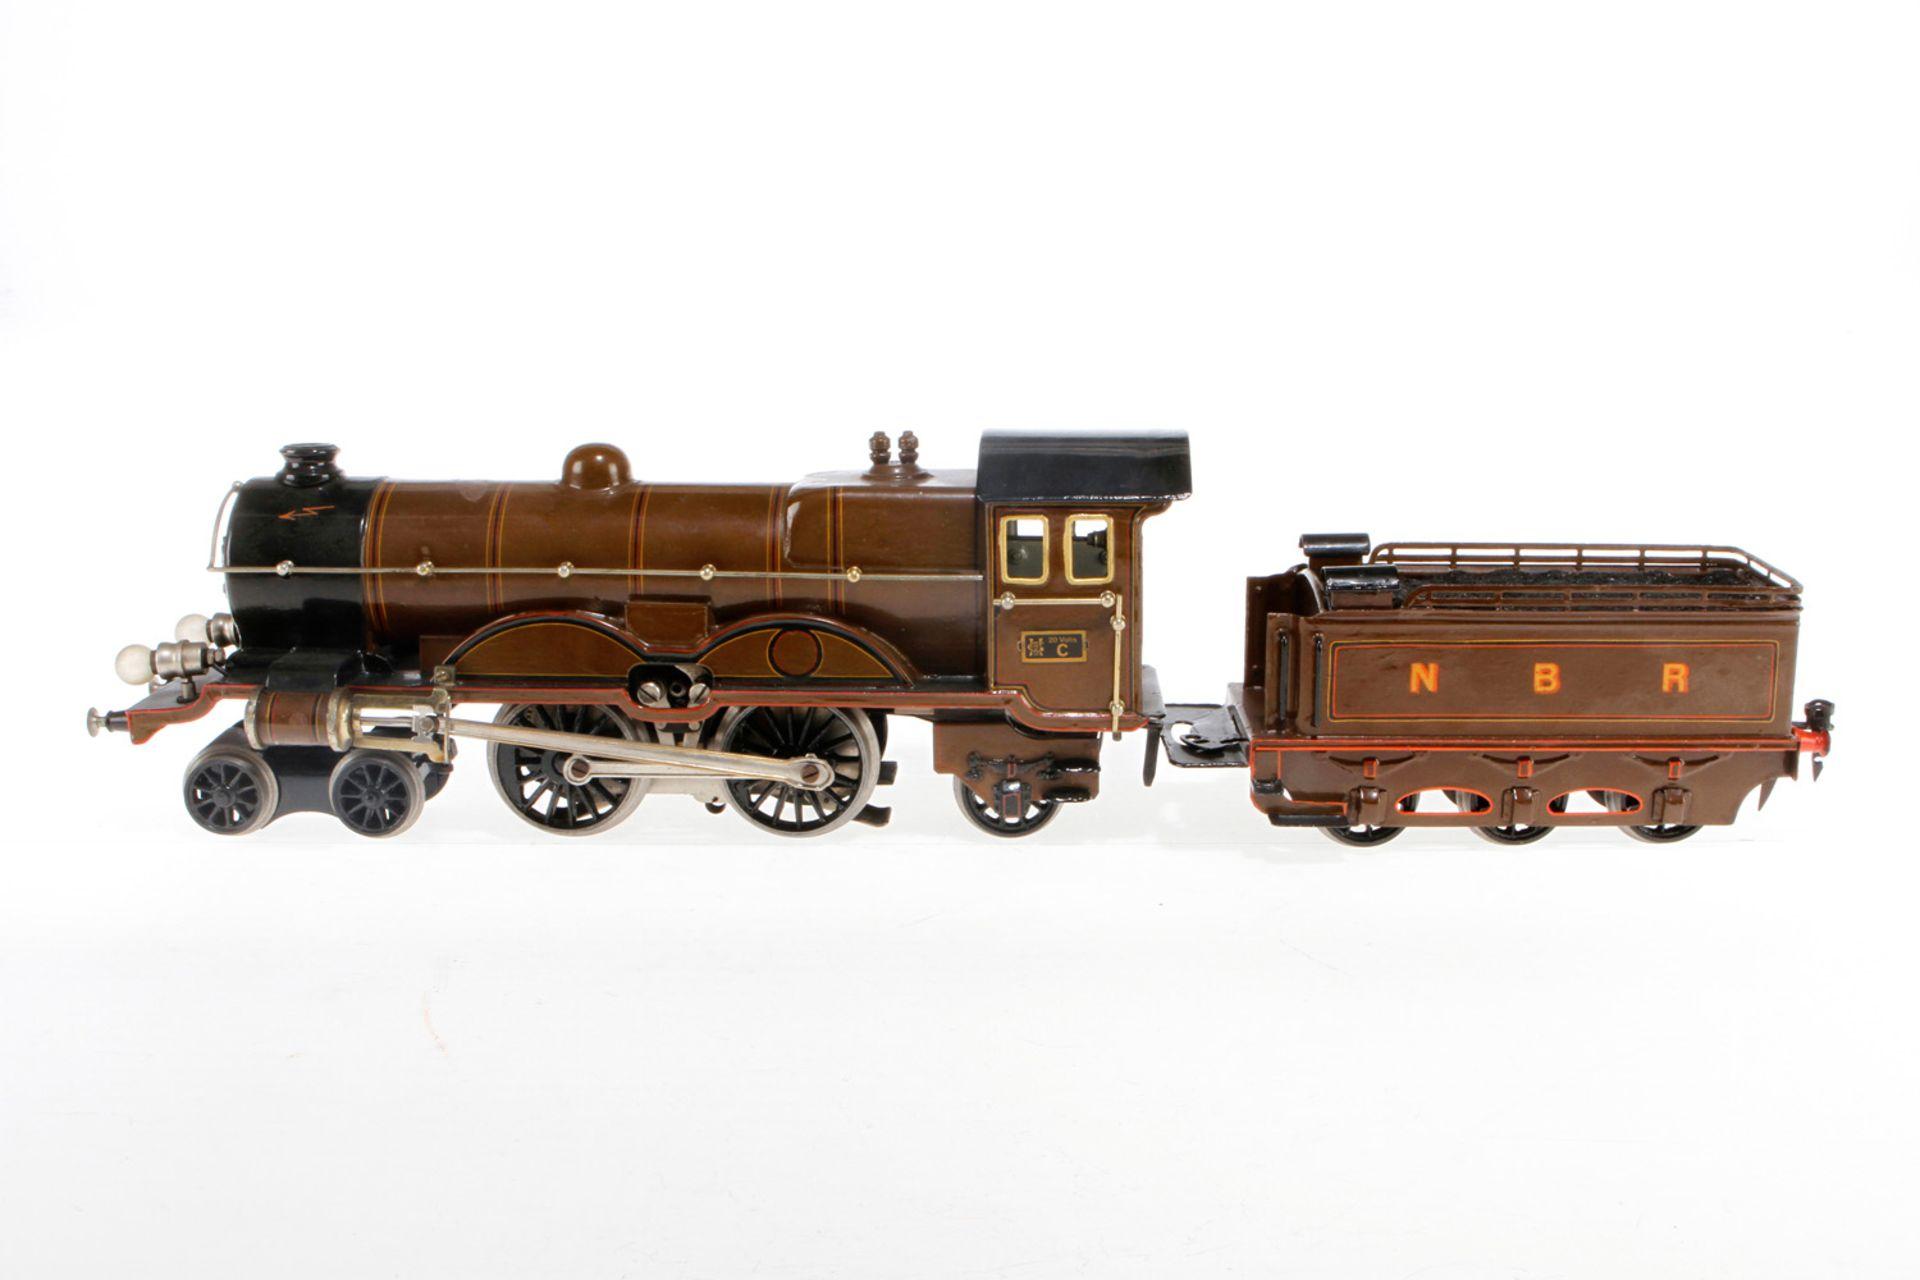 Märklin engl. 2-B-1 Dampflok CE 65/13021 NBR, S 1, elektr., braun/schwarz, mit Tender und 2 el. bel.